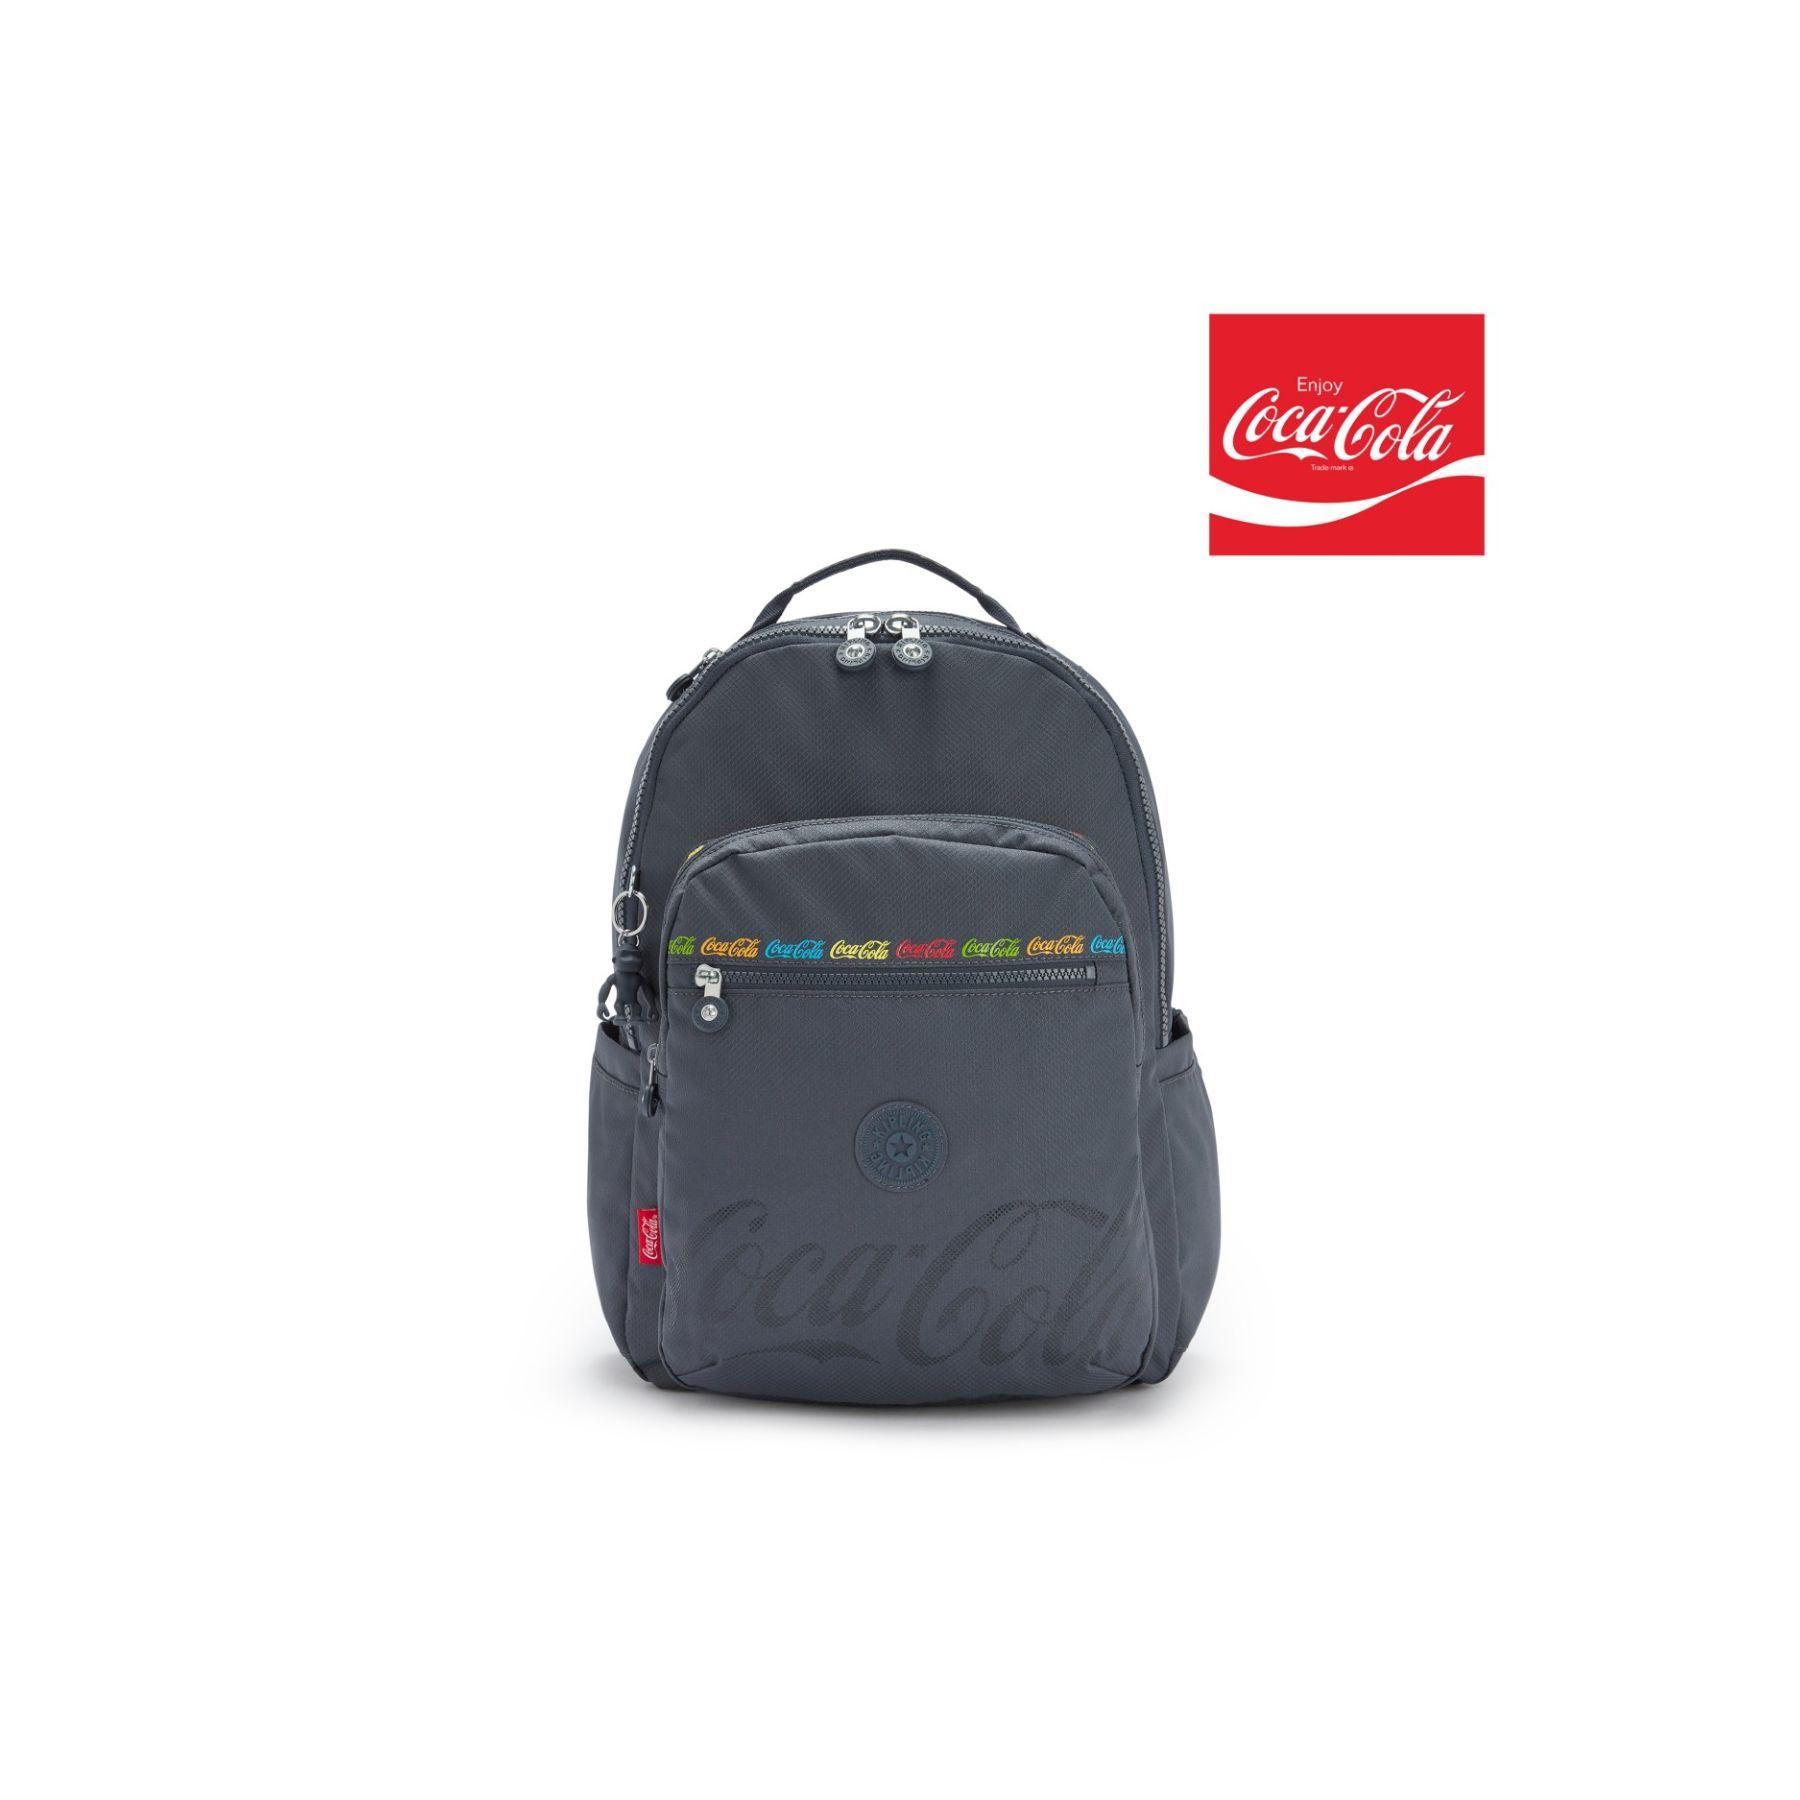 Mochila Kipling Seoul Coca-Cola Graphics